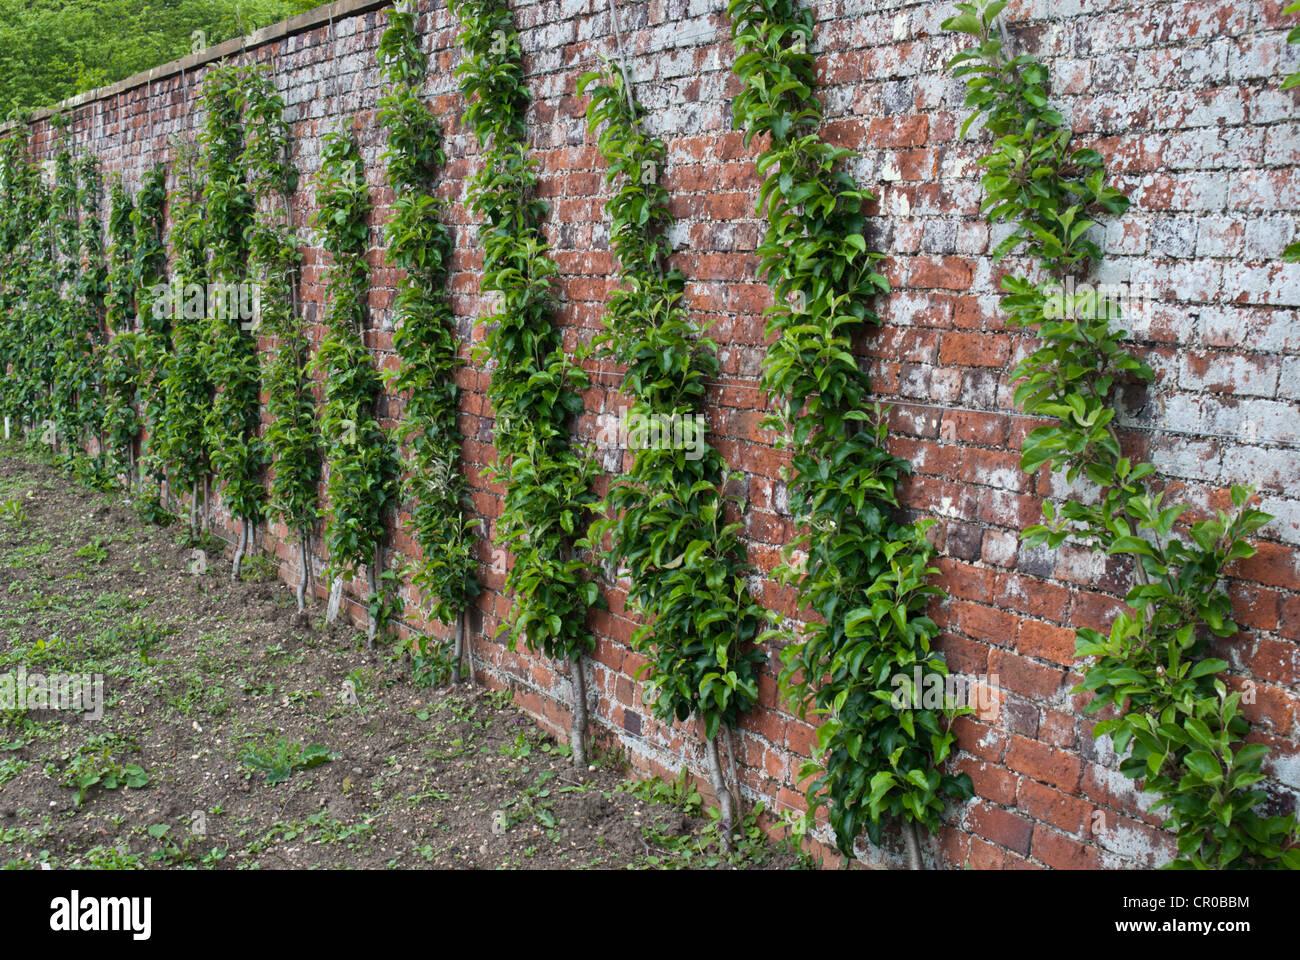 Cordon Apple Trees Stock Photos Cordon Apple Trees Stock Images